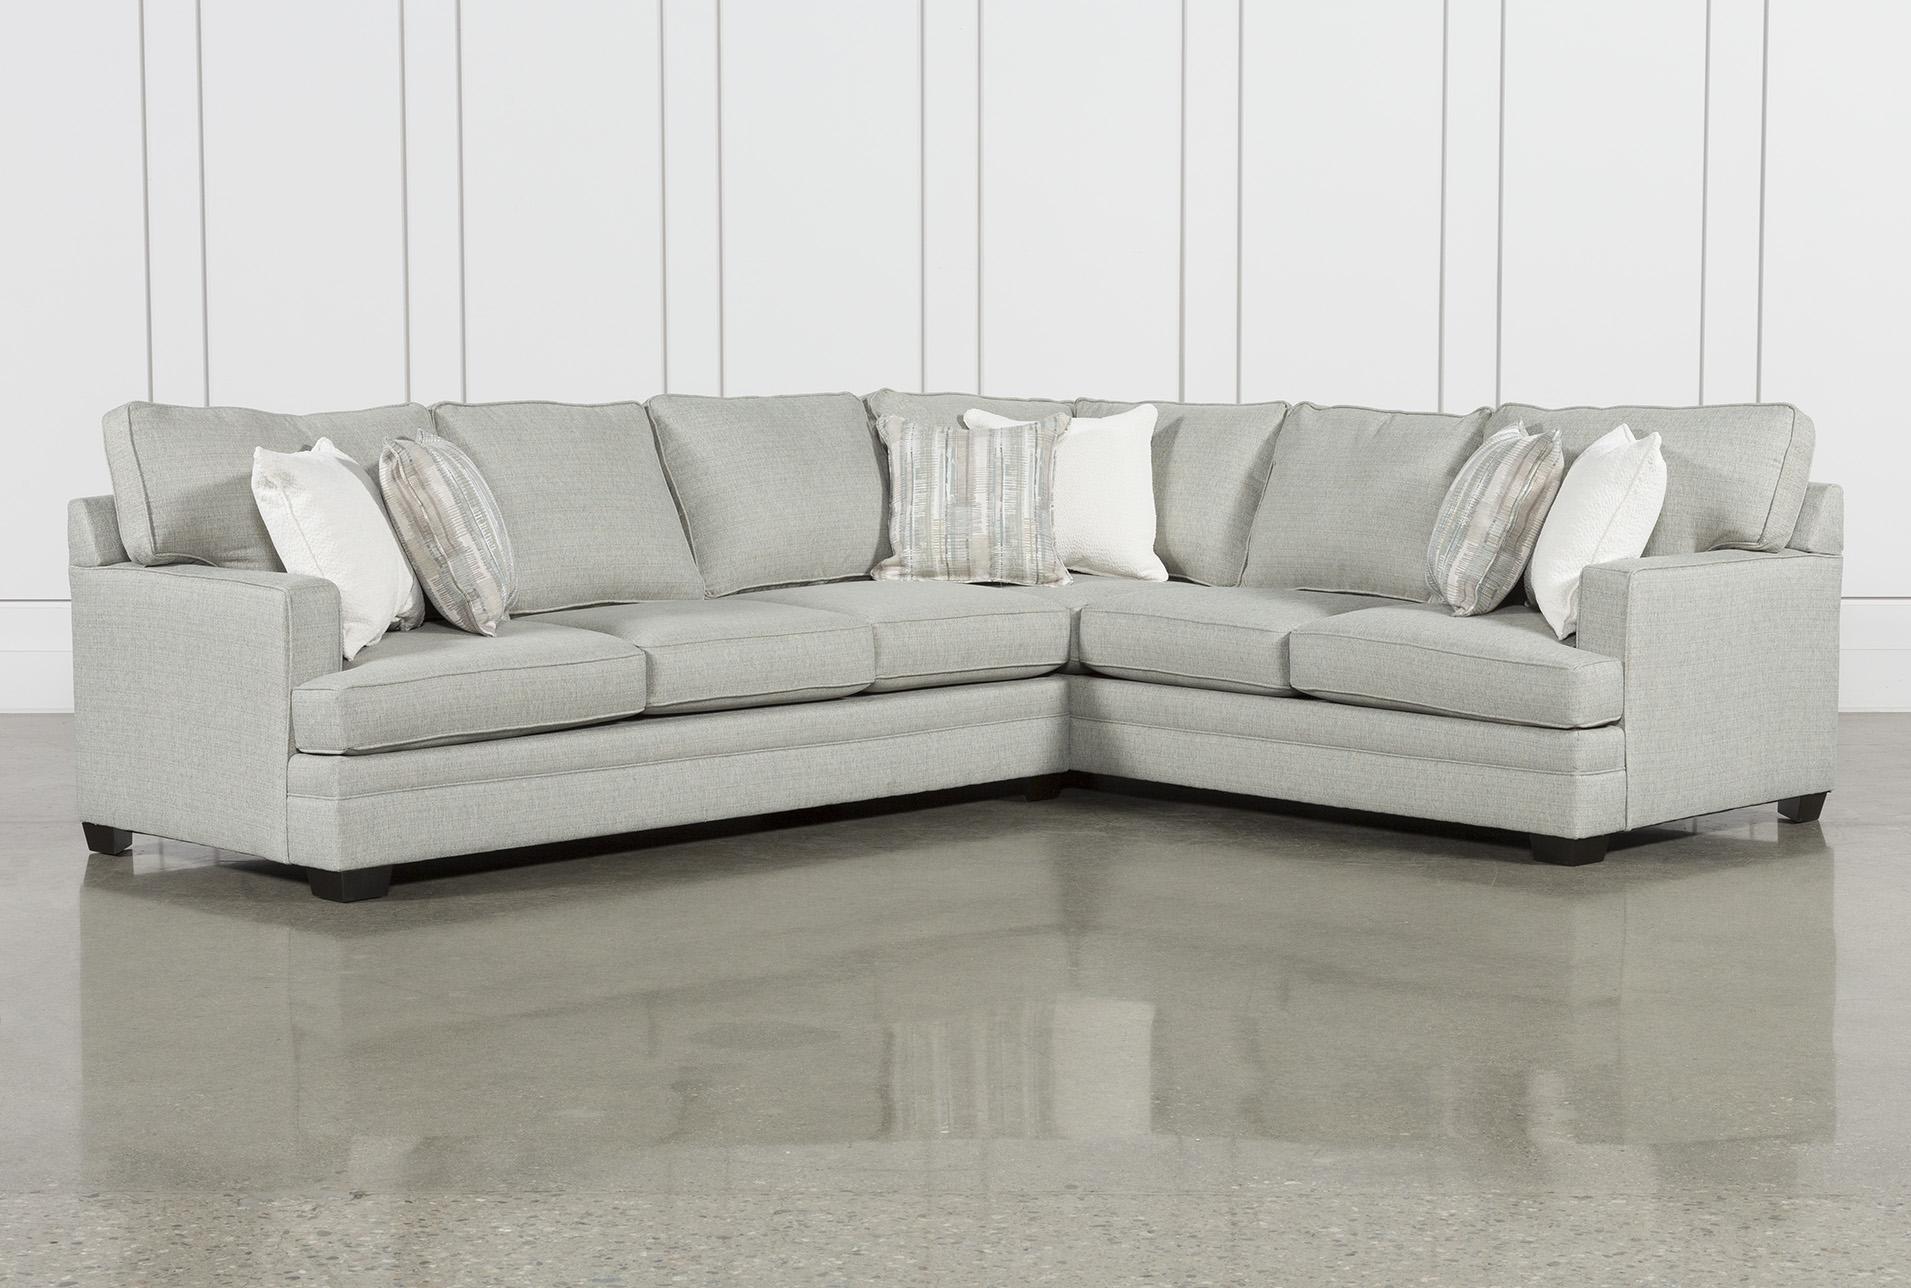 Josephine Ii 2 Piece Sectional With Left Arm Facing Sofa 2 Piece